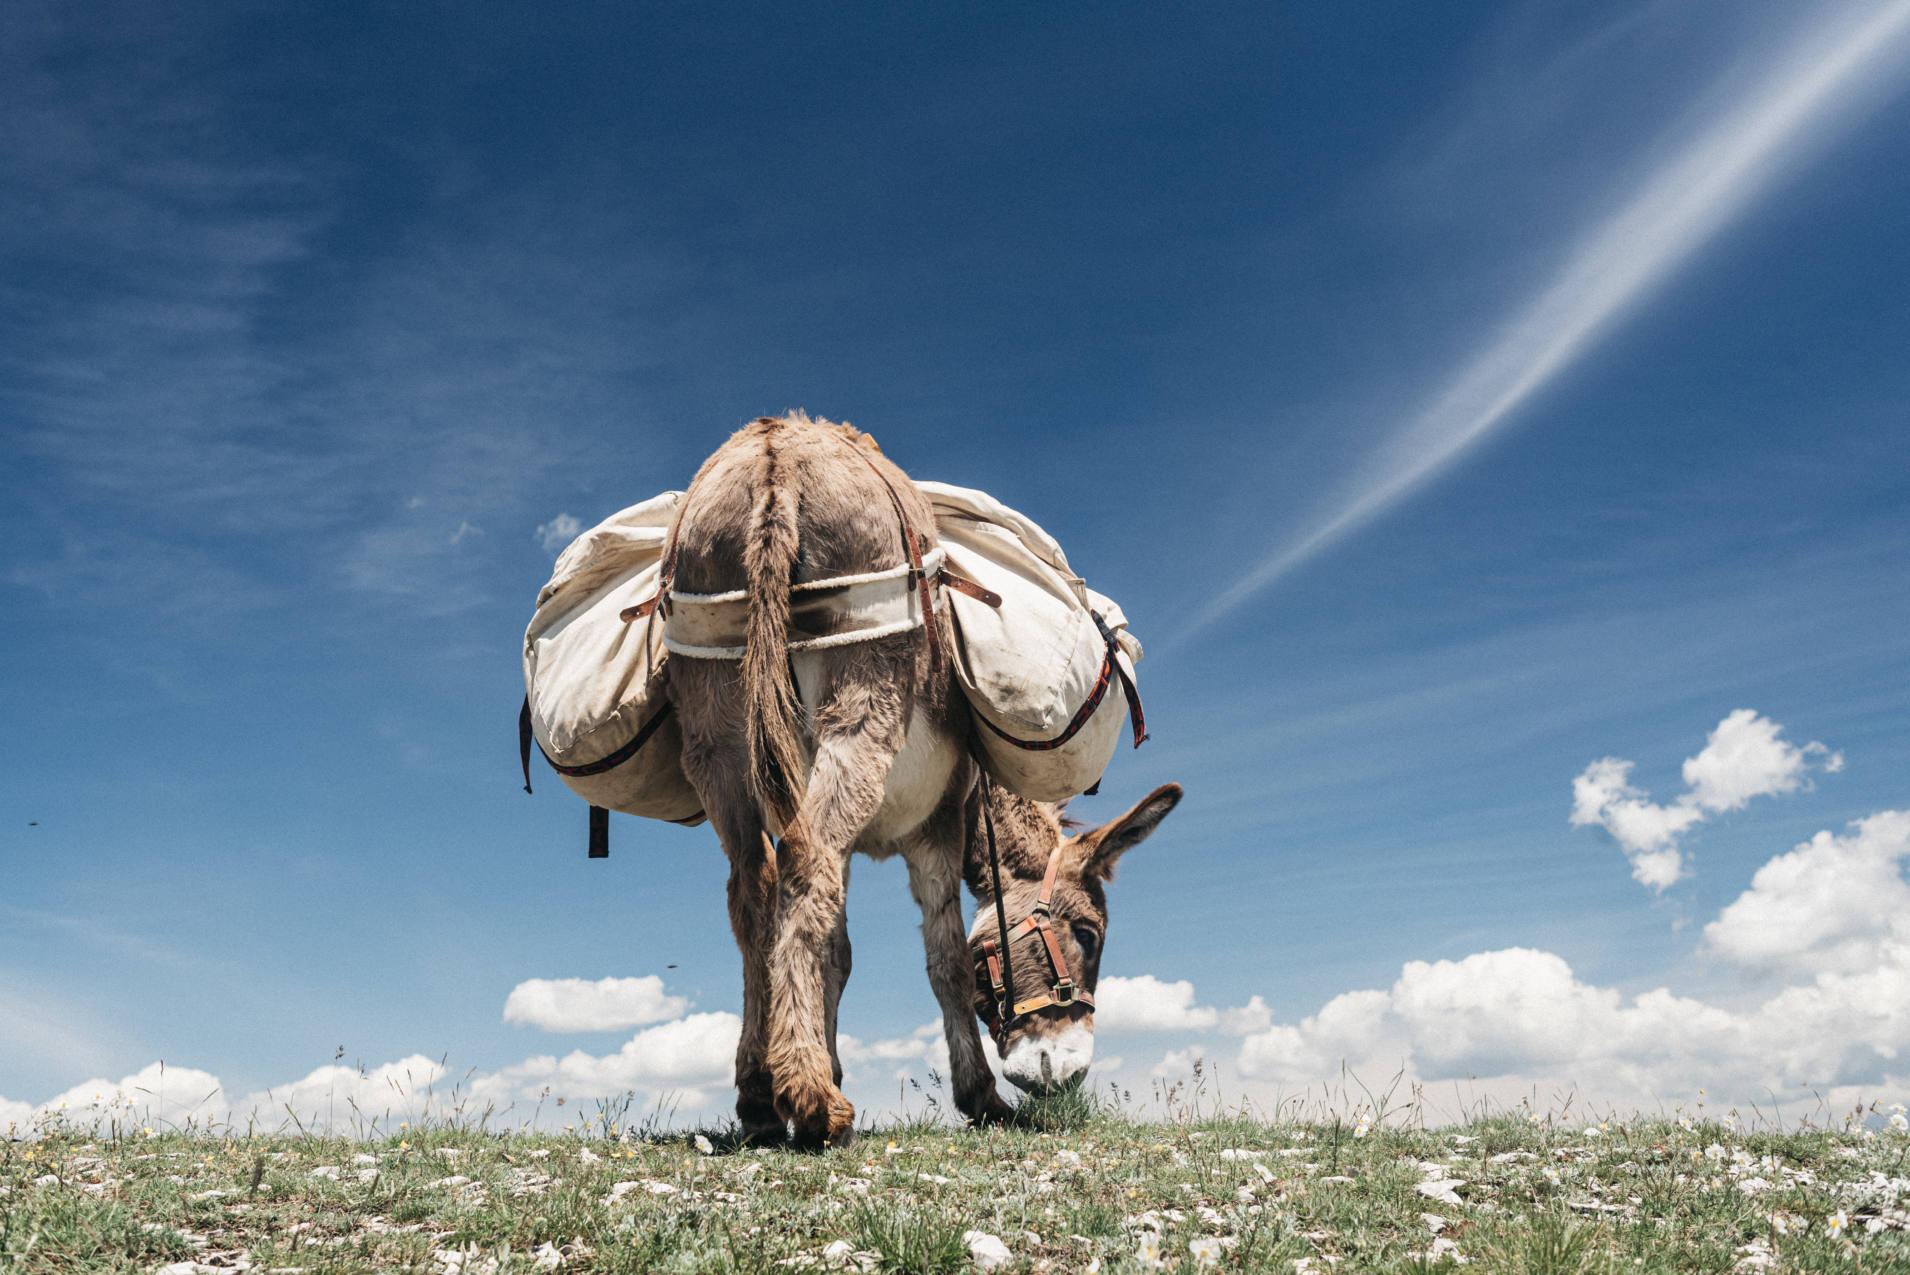 un âne de bât en balade dans la Drôme - photo Maité Baldi